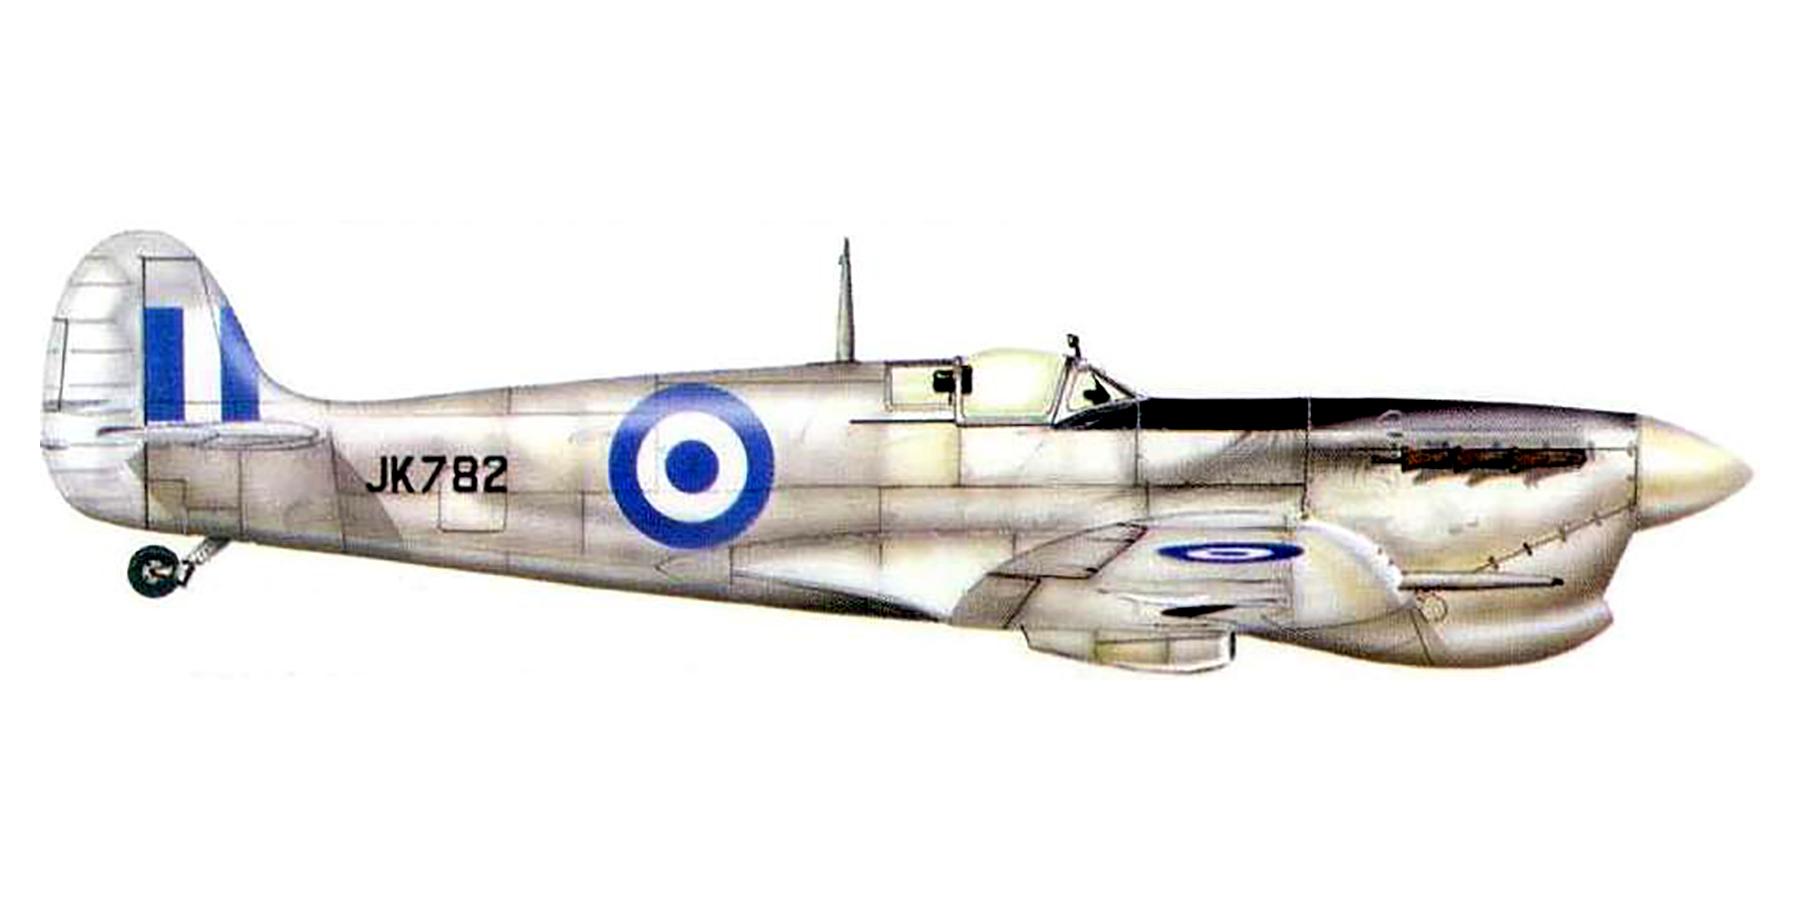 Spitfire MkVcTrop RHAF JK782 Thessalonica Greece 1945 0A